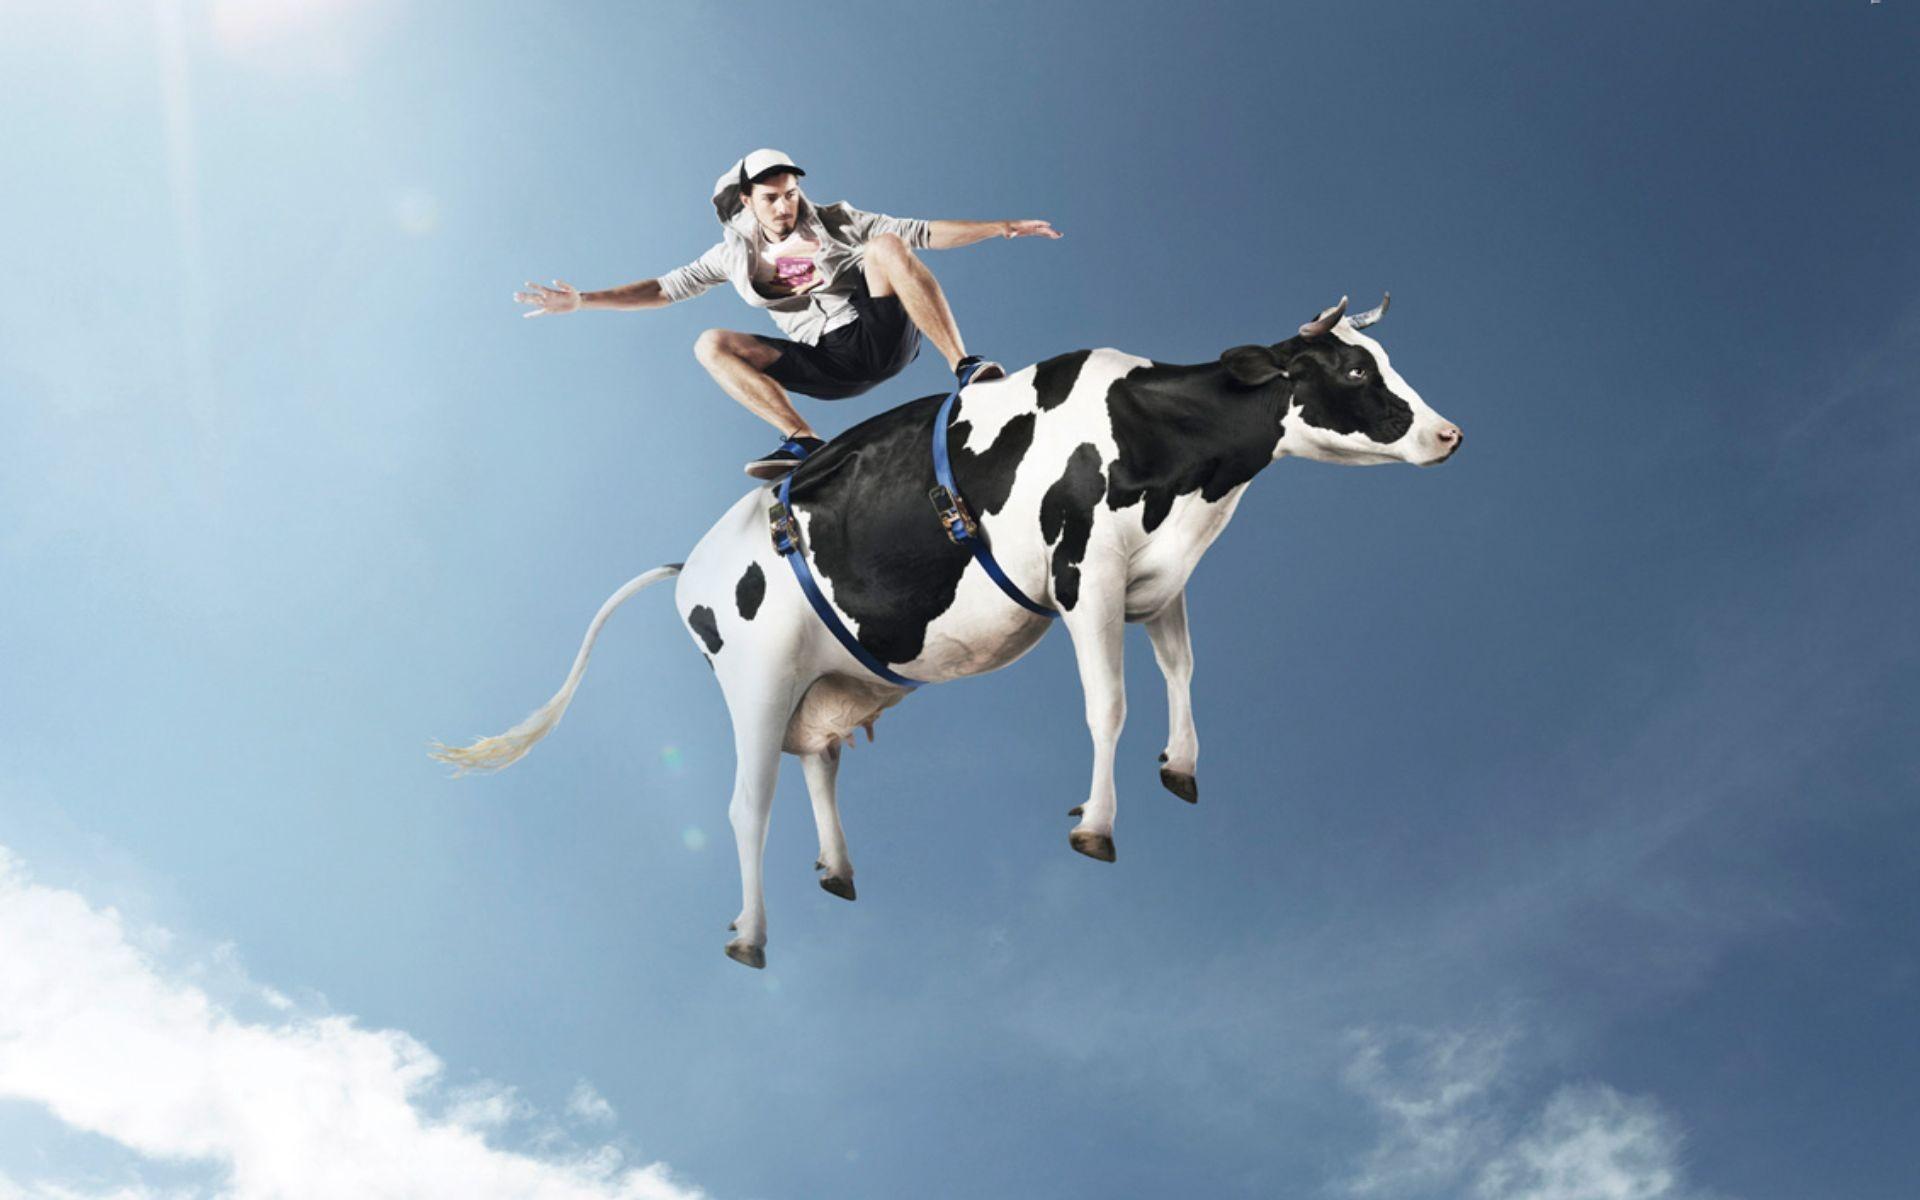 Wallpaper : men, humor, jumping, skateboard, cow ...